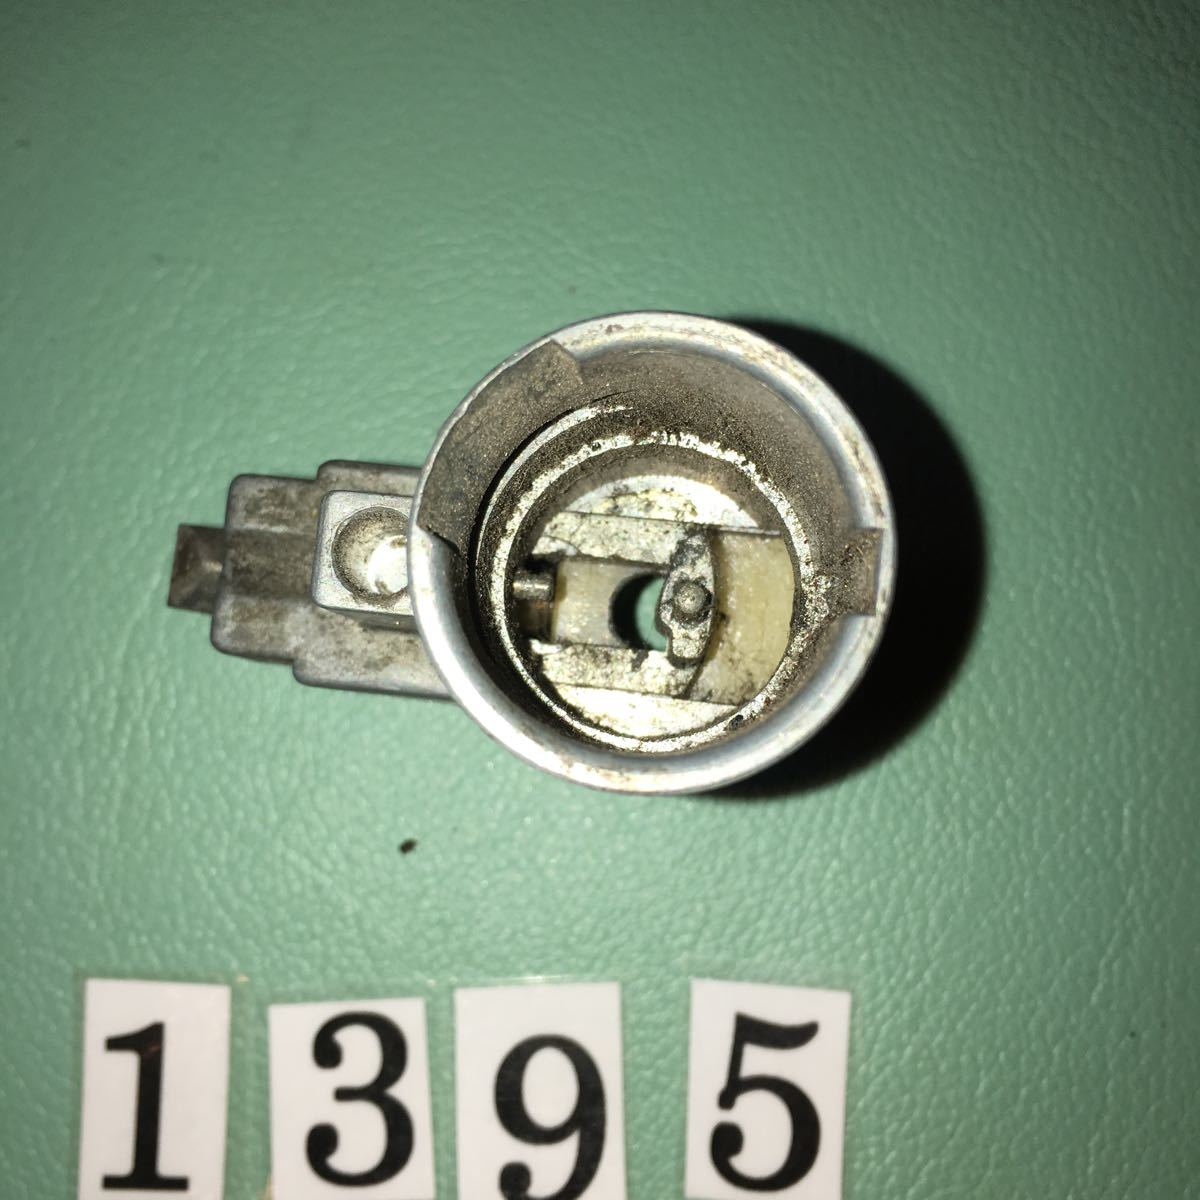 NO.1395 空冷 VW フォルクスワーゲン イグニッション ステアリング ロック 111905851N ビートル カルマンギア ポルシェ914 純正_画像6